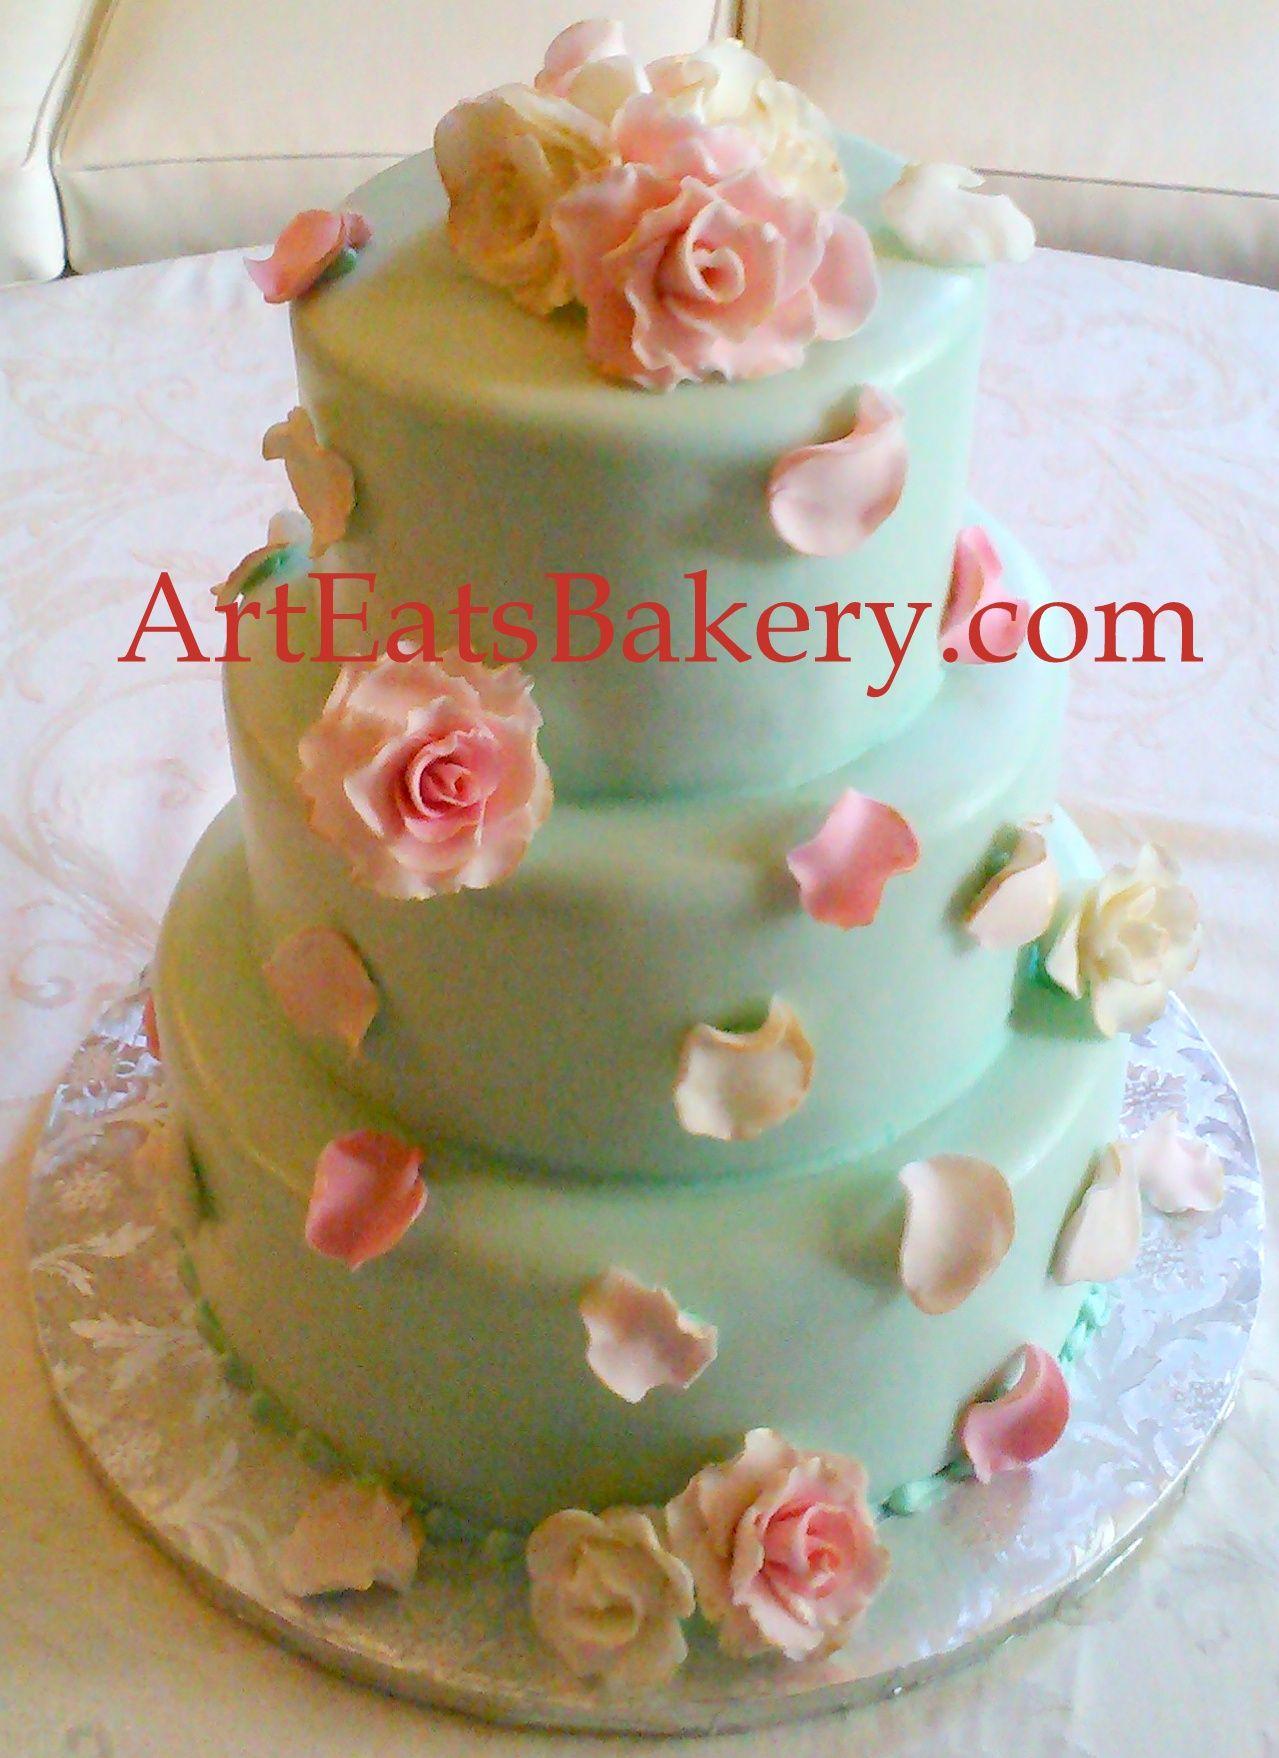 Amazing Art Eats Bakery 1626 East North Street, Greenville, SC 29607Three Tier Mint  Green Fondant Elegant Romantic Custom Unique Wedding Cake Design With  Edible ...